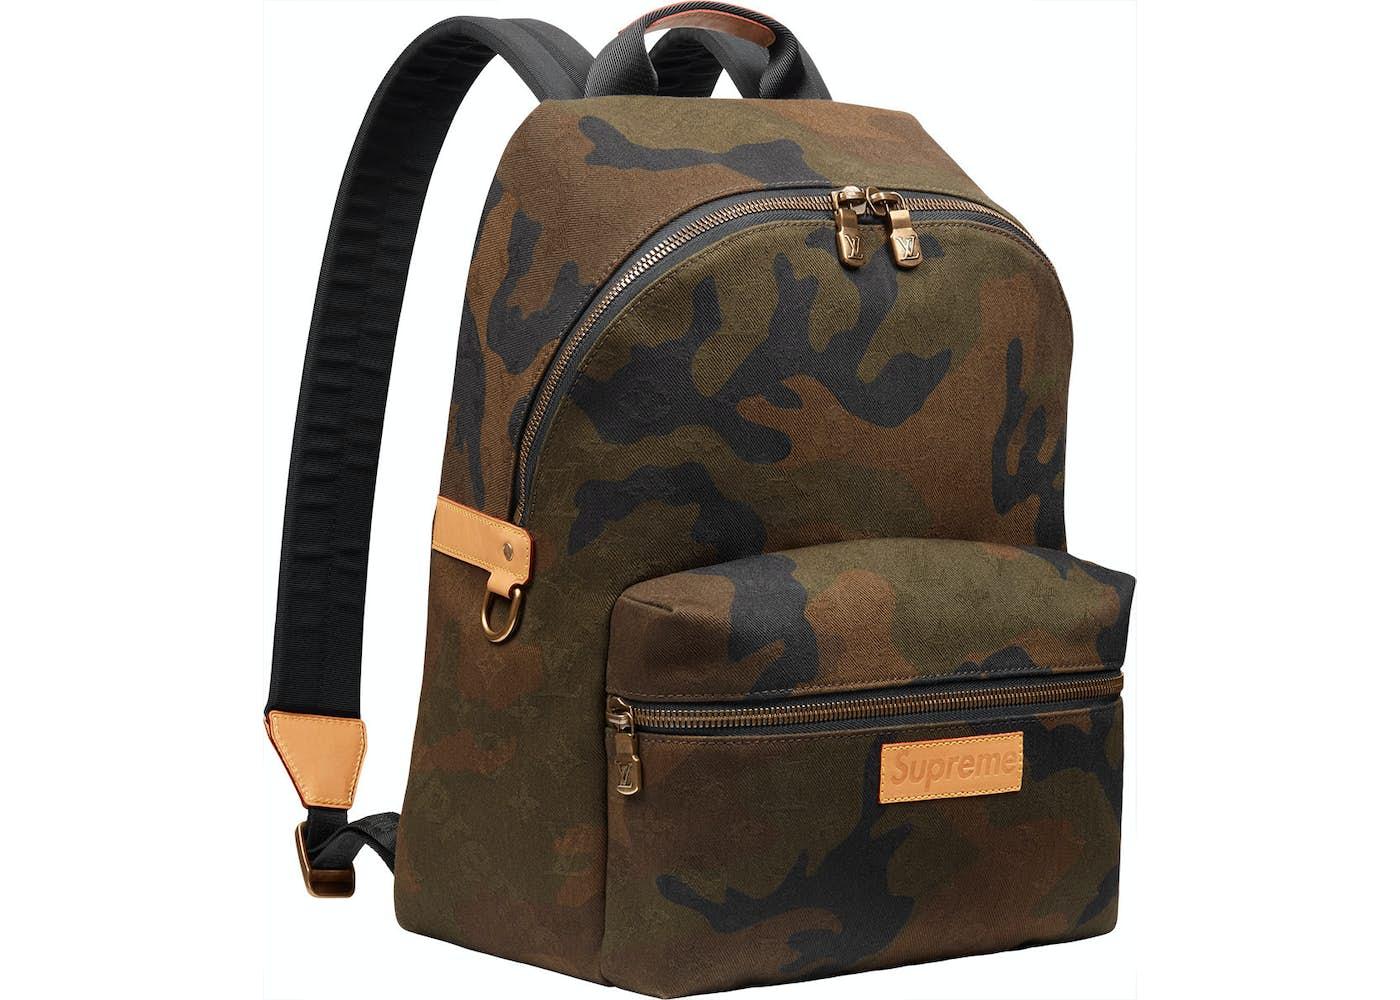 louis vuitton x supreme apollo backpack monogram camo. Black Bedroom Furniture Sets. Home Design Ideas